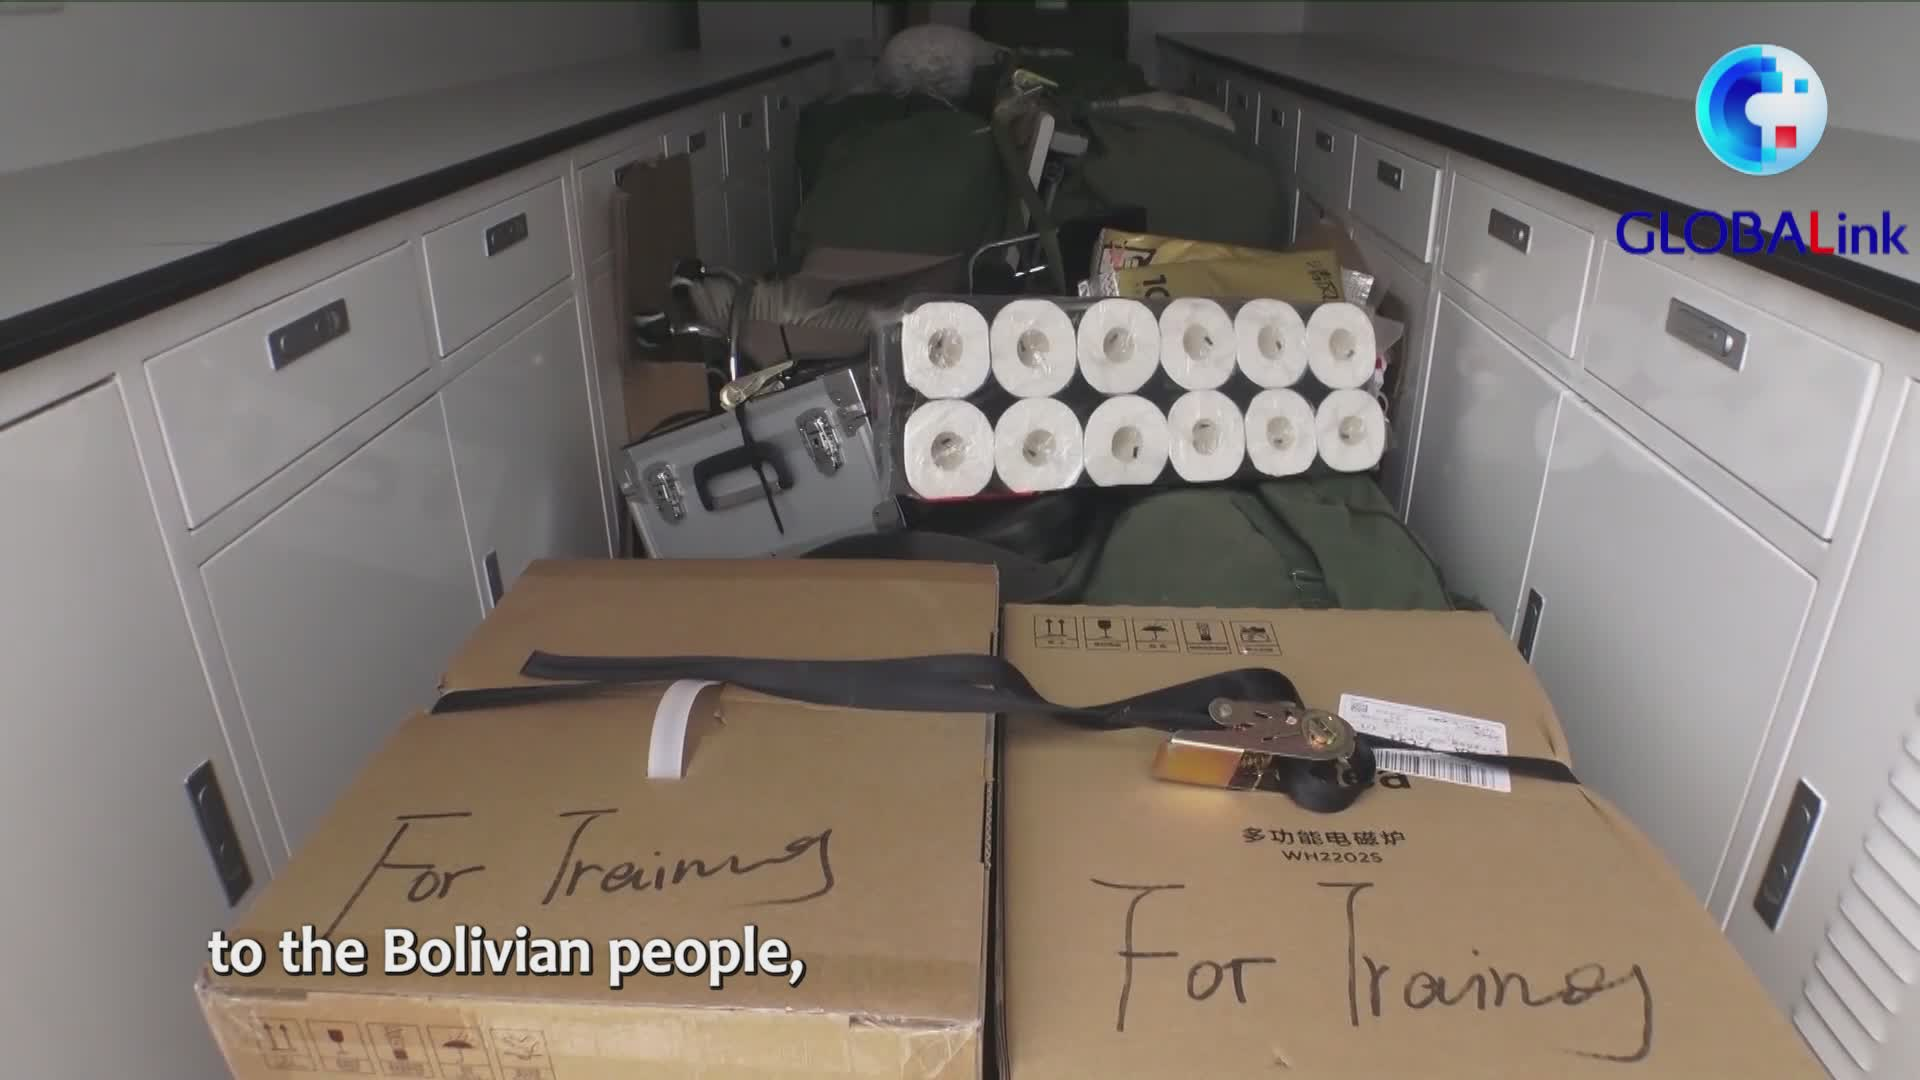 GLOBALink | Bolivia receives medical donations from China